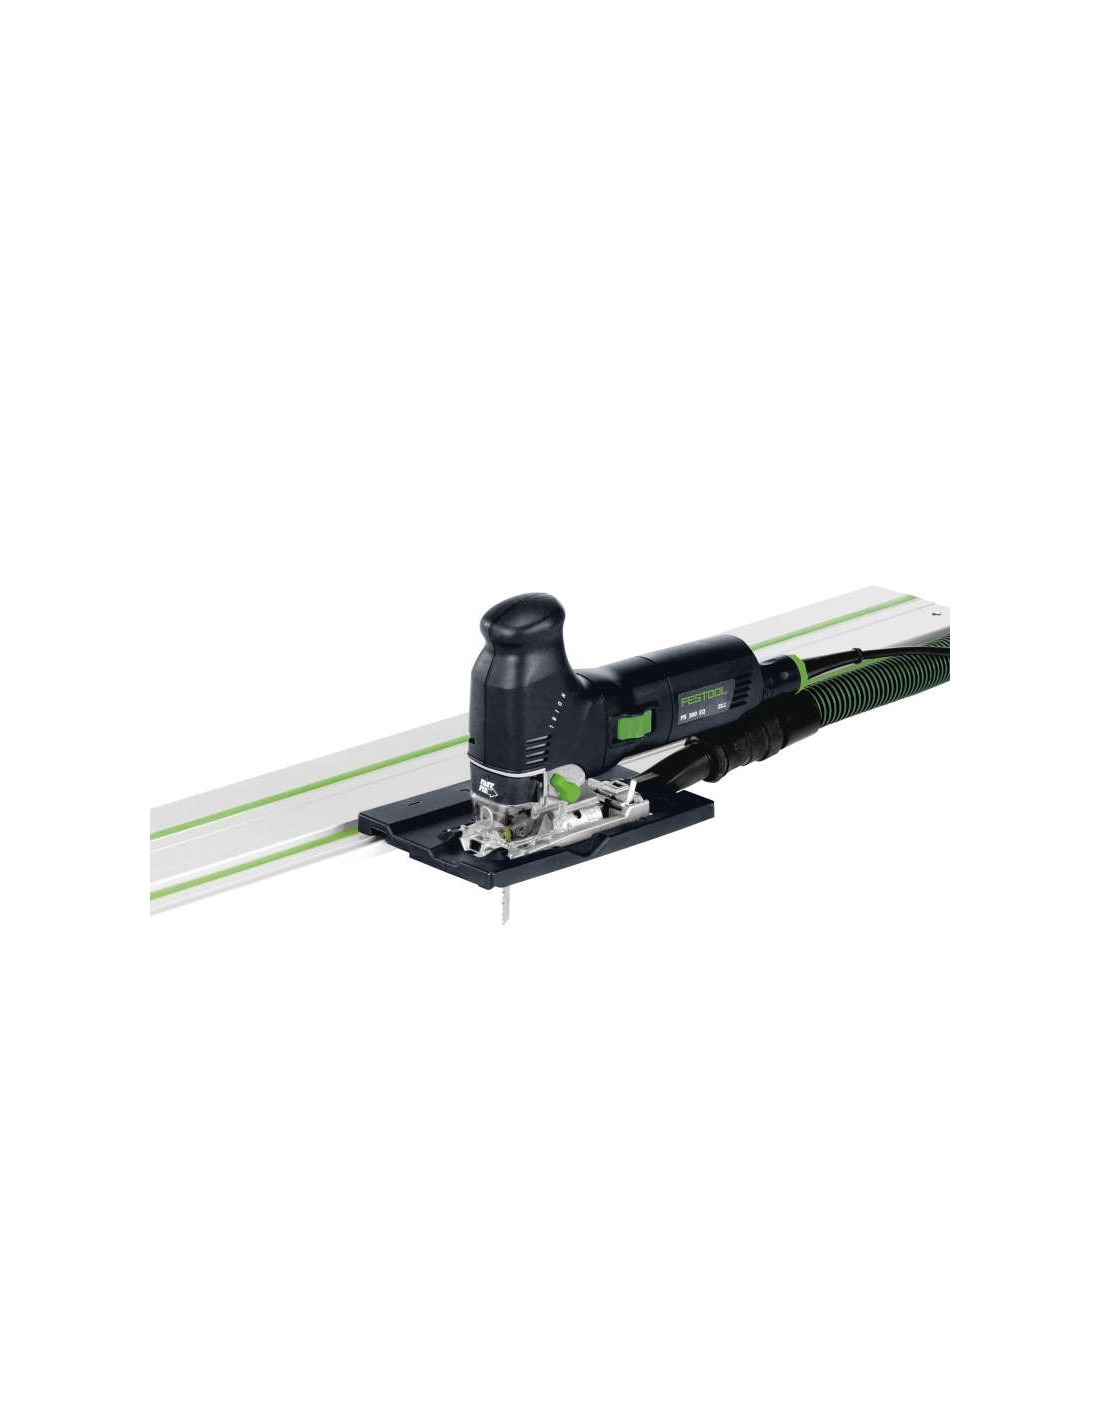 Butée de guidage FS-PS PSB 300 - Festool pas cher abba4faf5c41